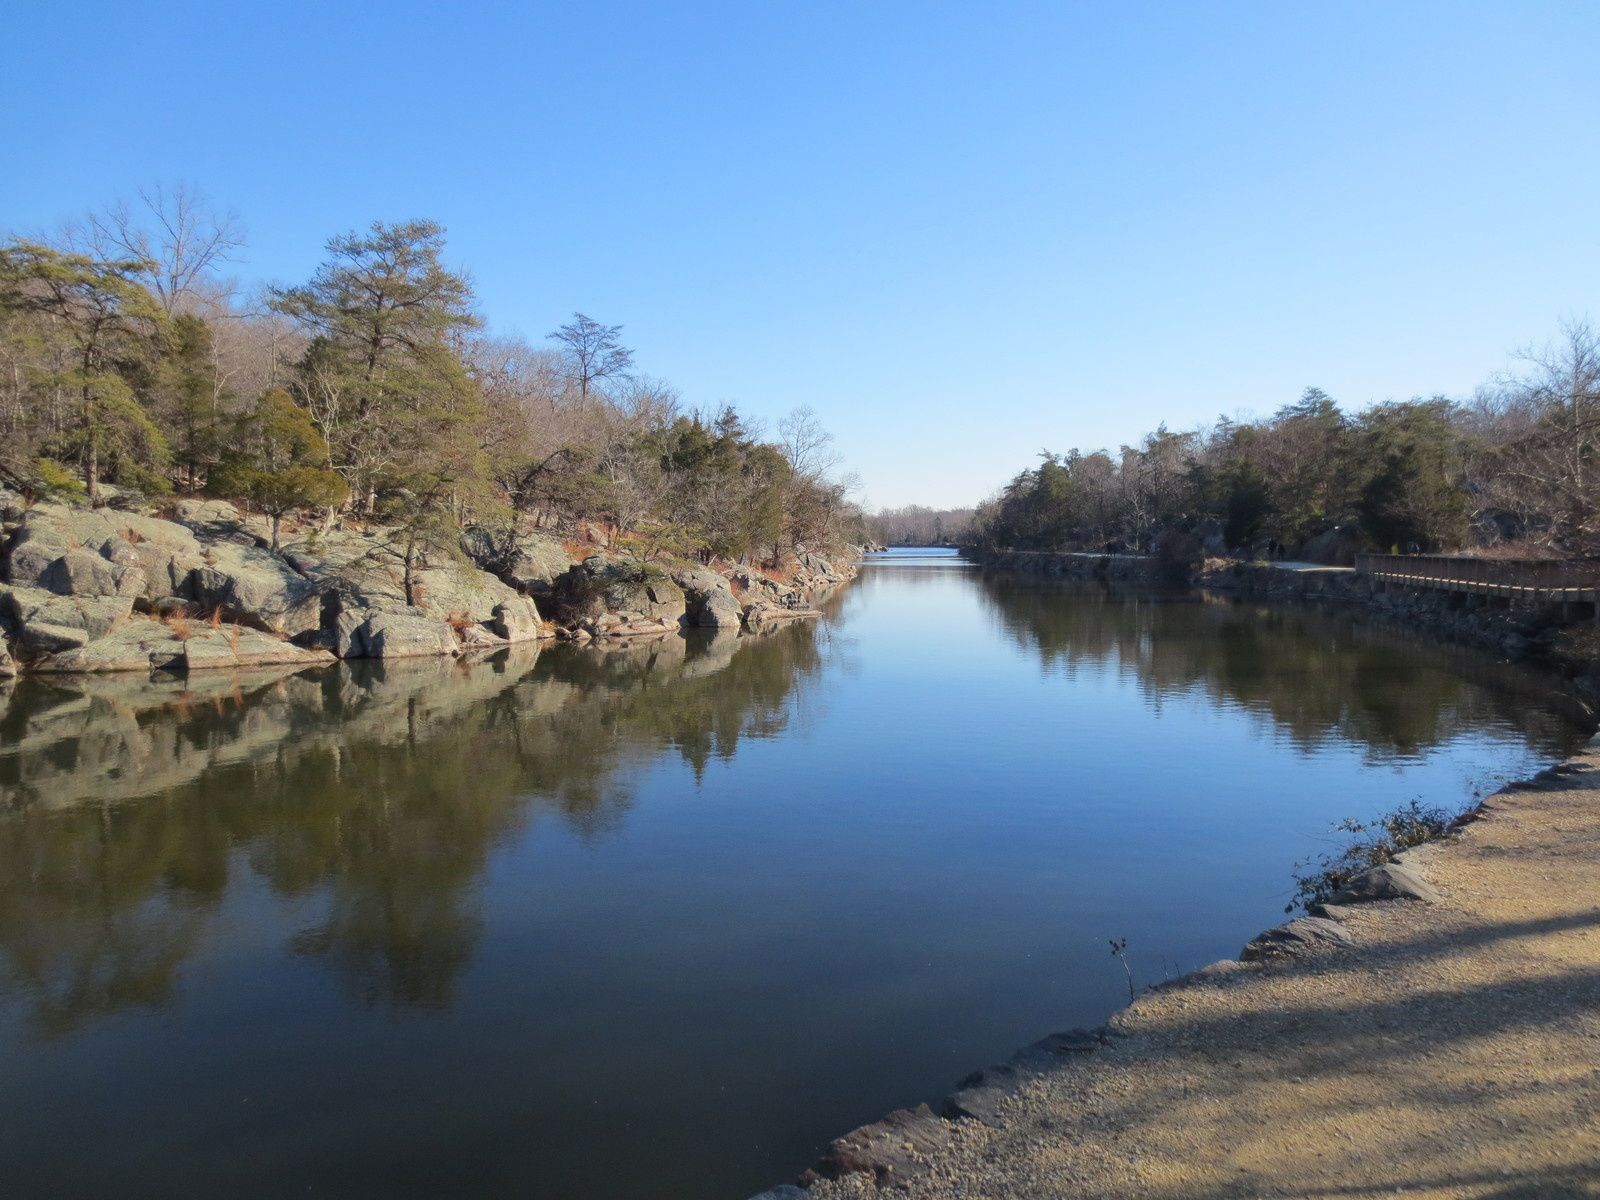 A proximité du Potomac